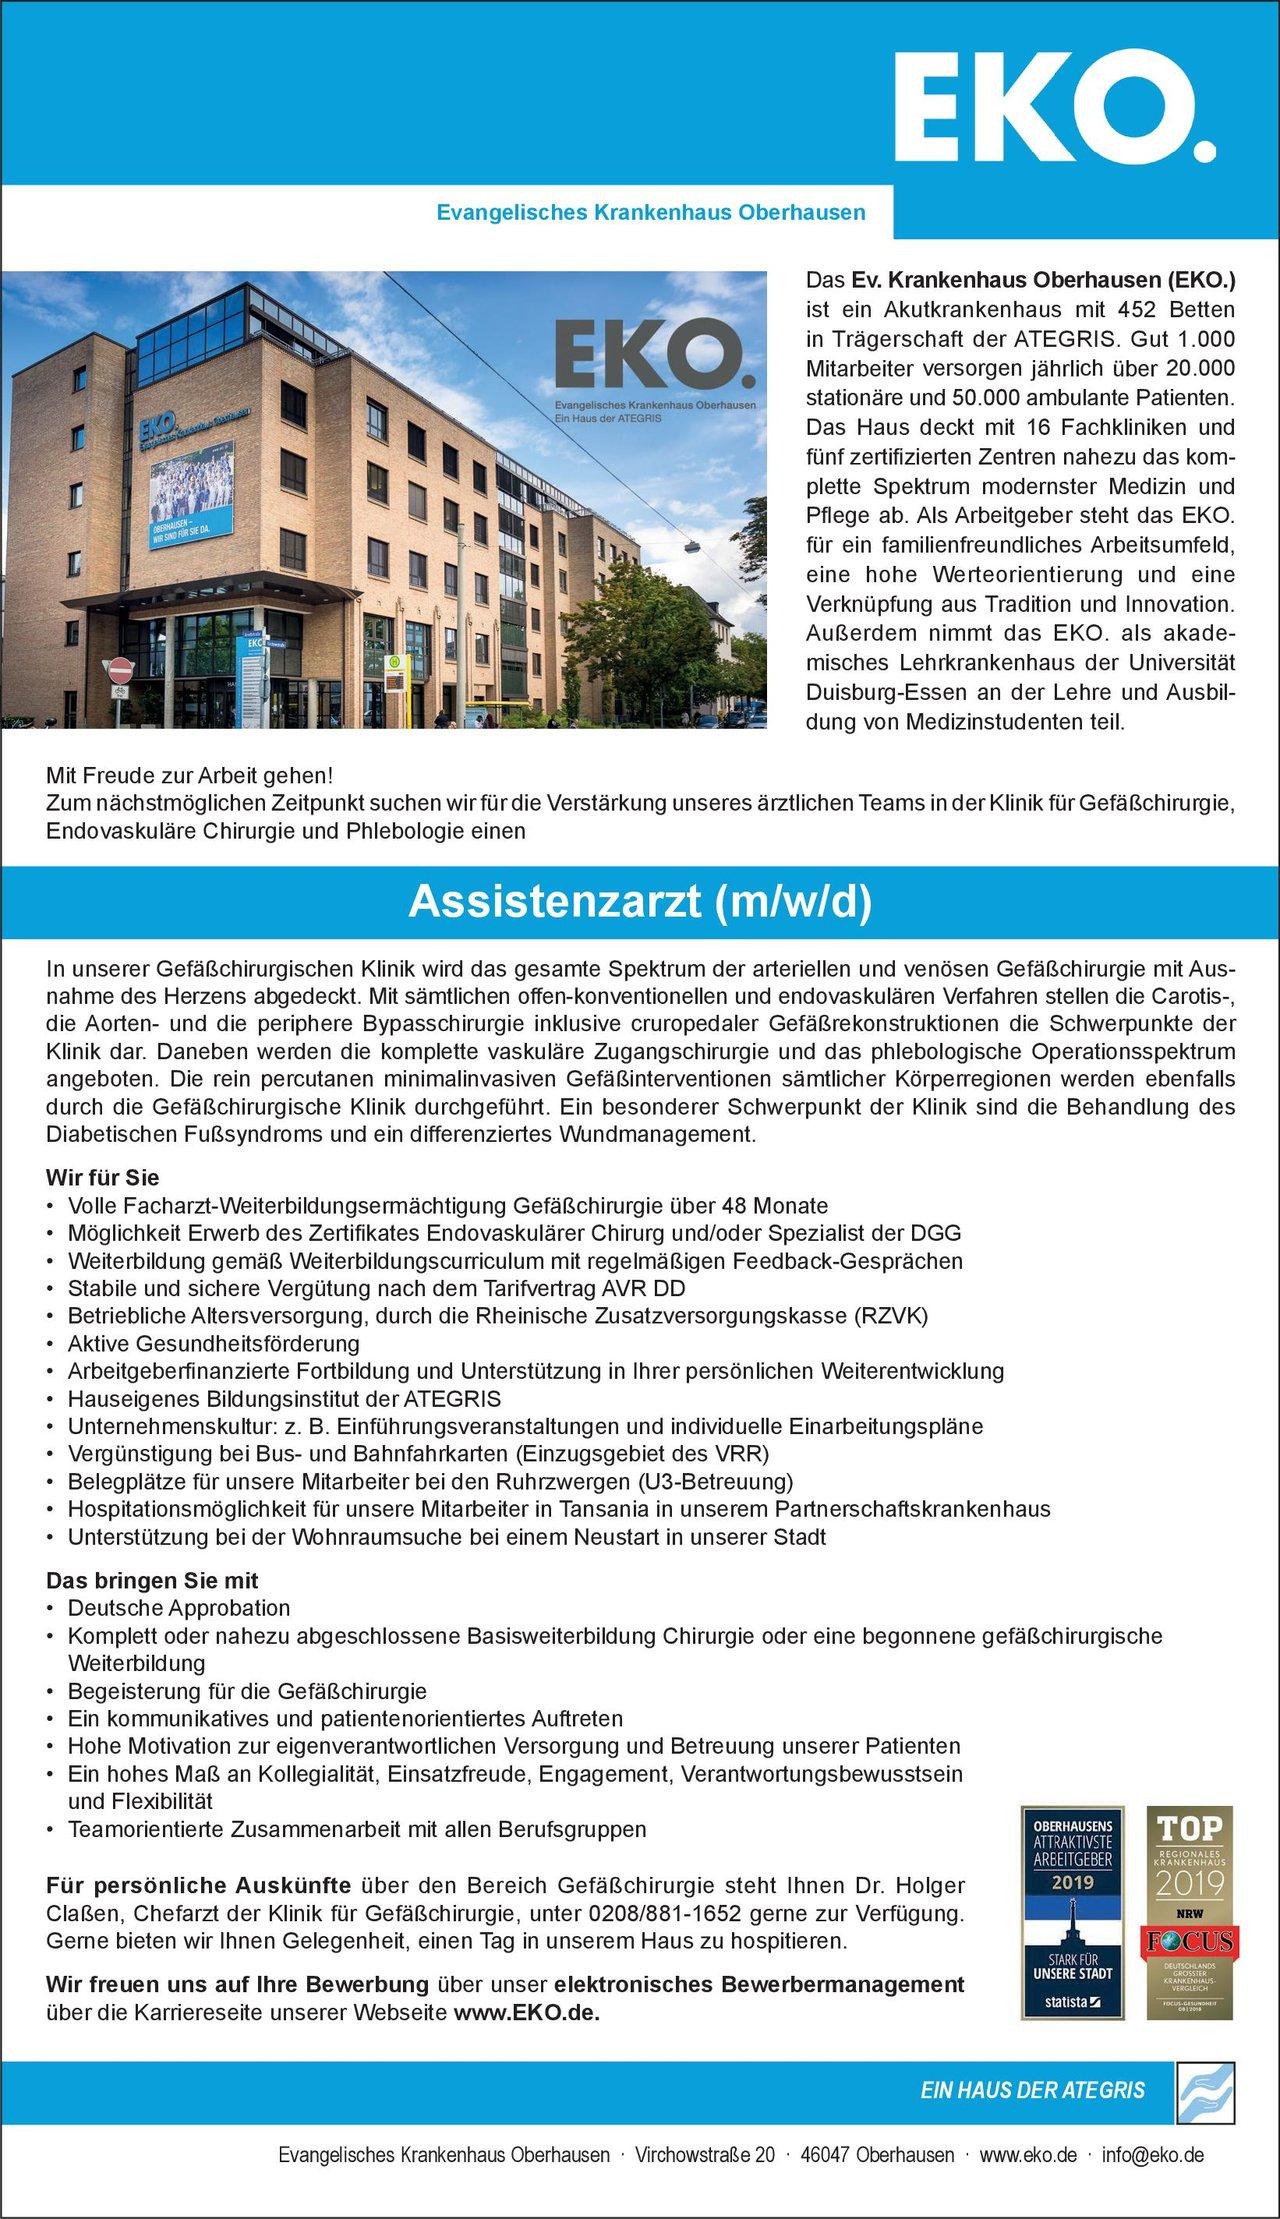 Evangelisches Krankenhaus Oberhausen Assistenzarzt (m/w/d) Gefäßchirurgie  Gefäßchirurgie, Chirurgie Assistenzarzt / Arzt in Weiterbildung